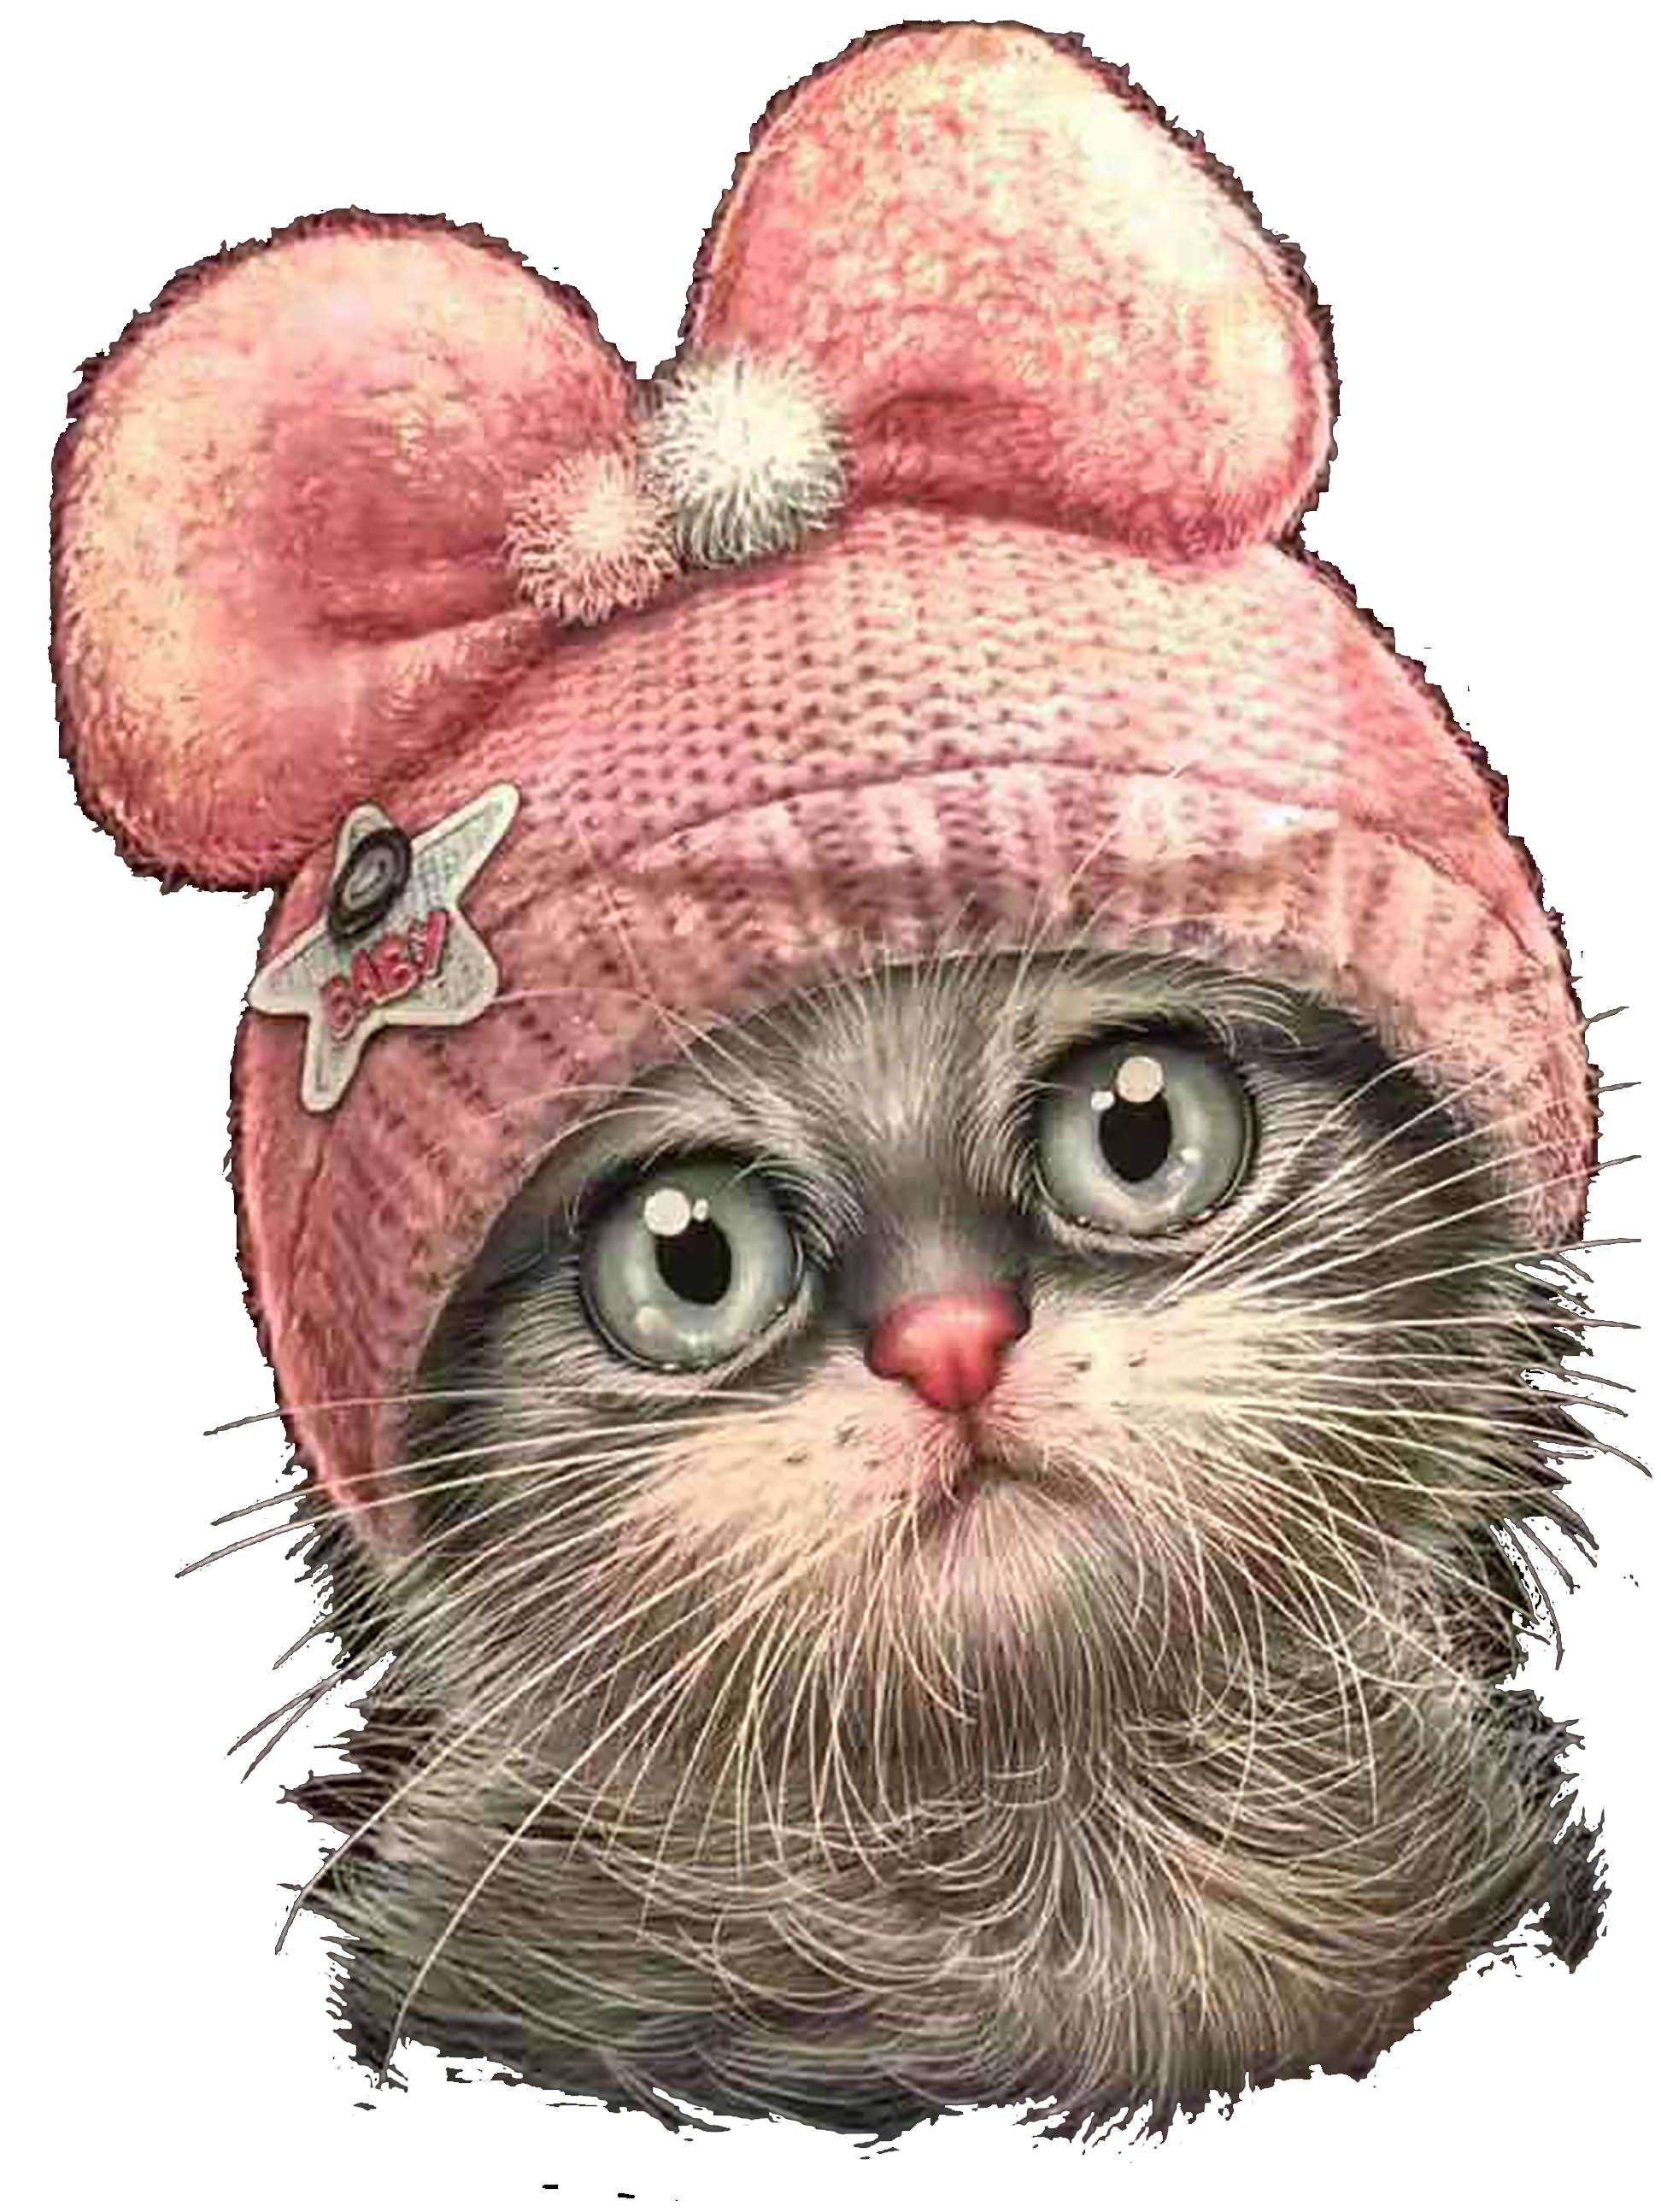 Pin By Jane Choban On ơ Lp L Kitten Drawing Cat Art Deer Art Print